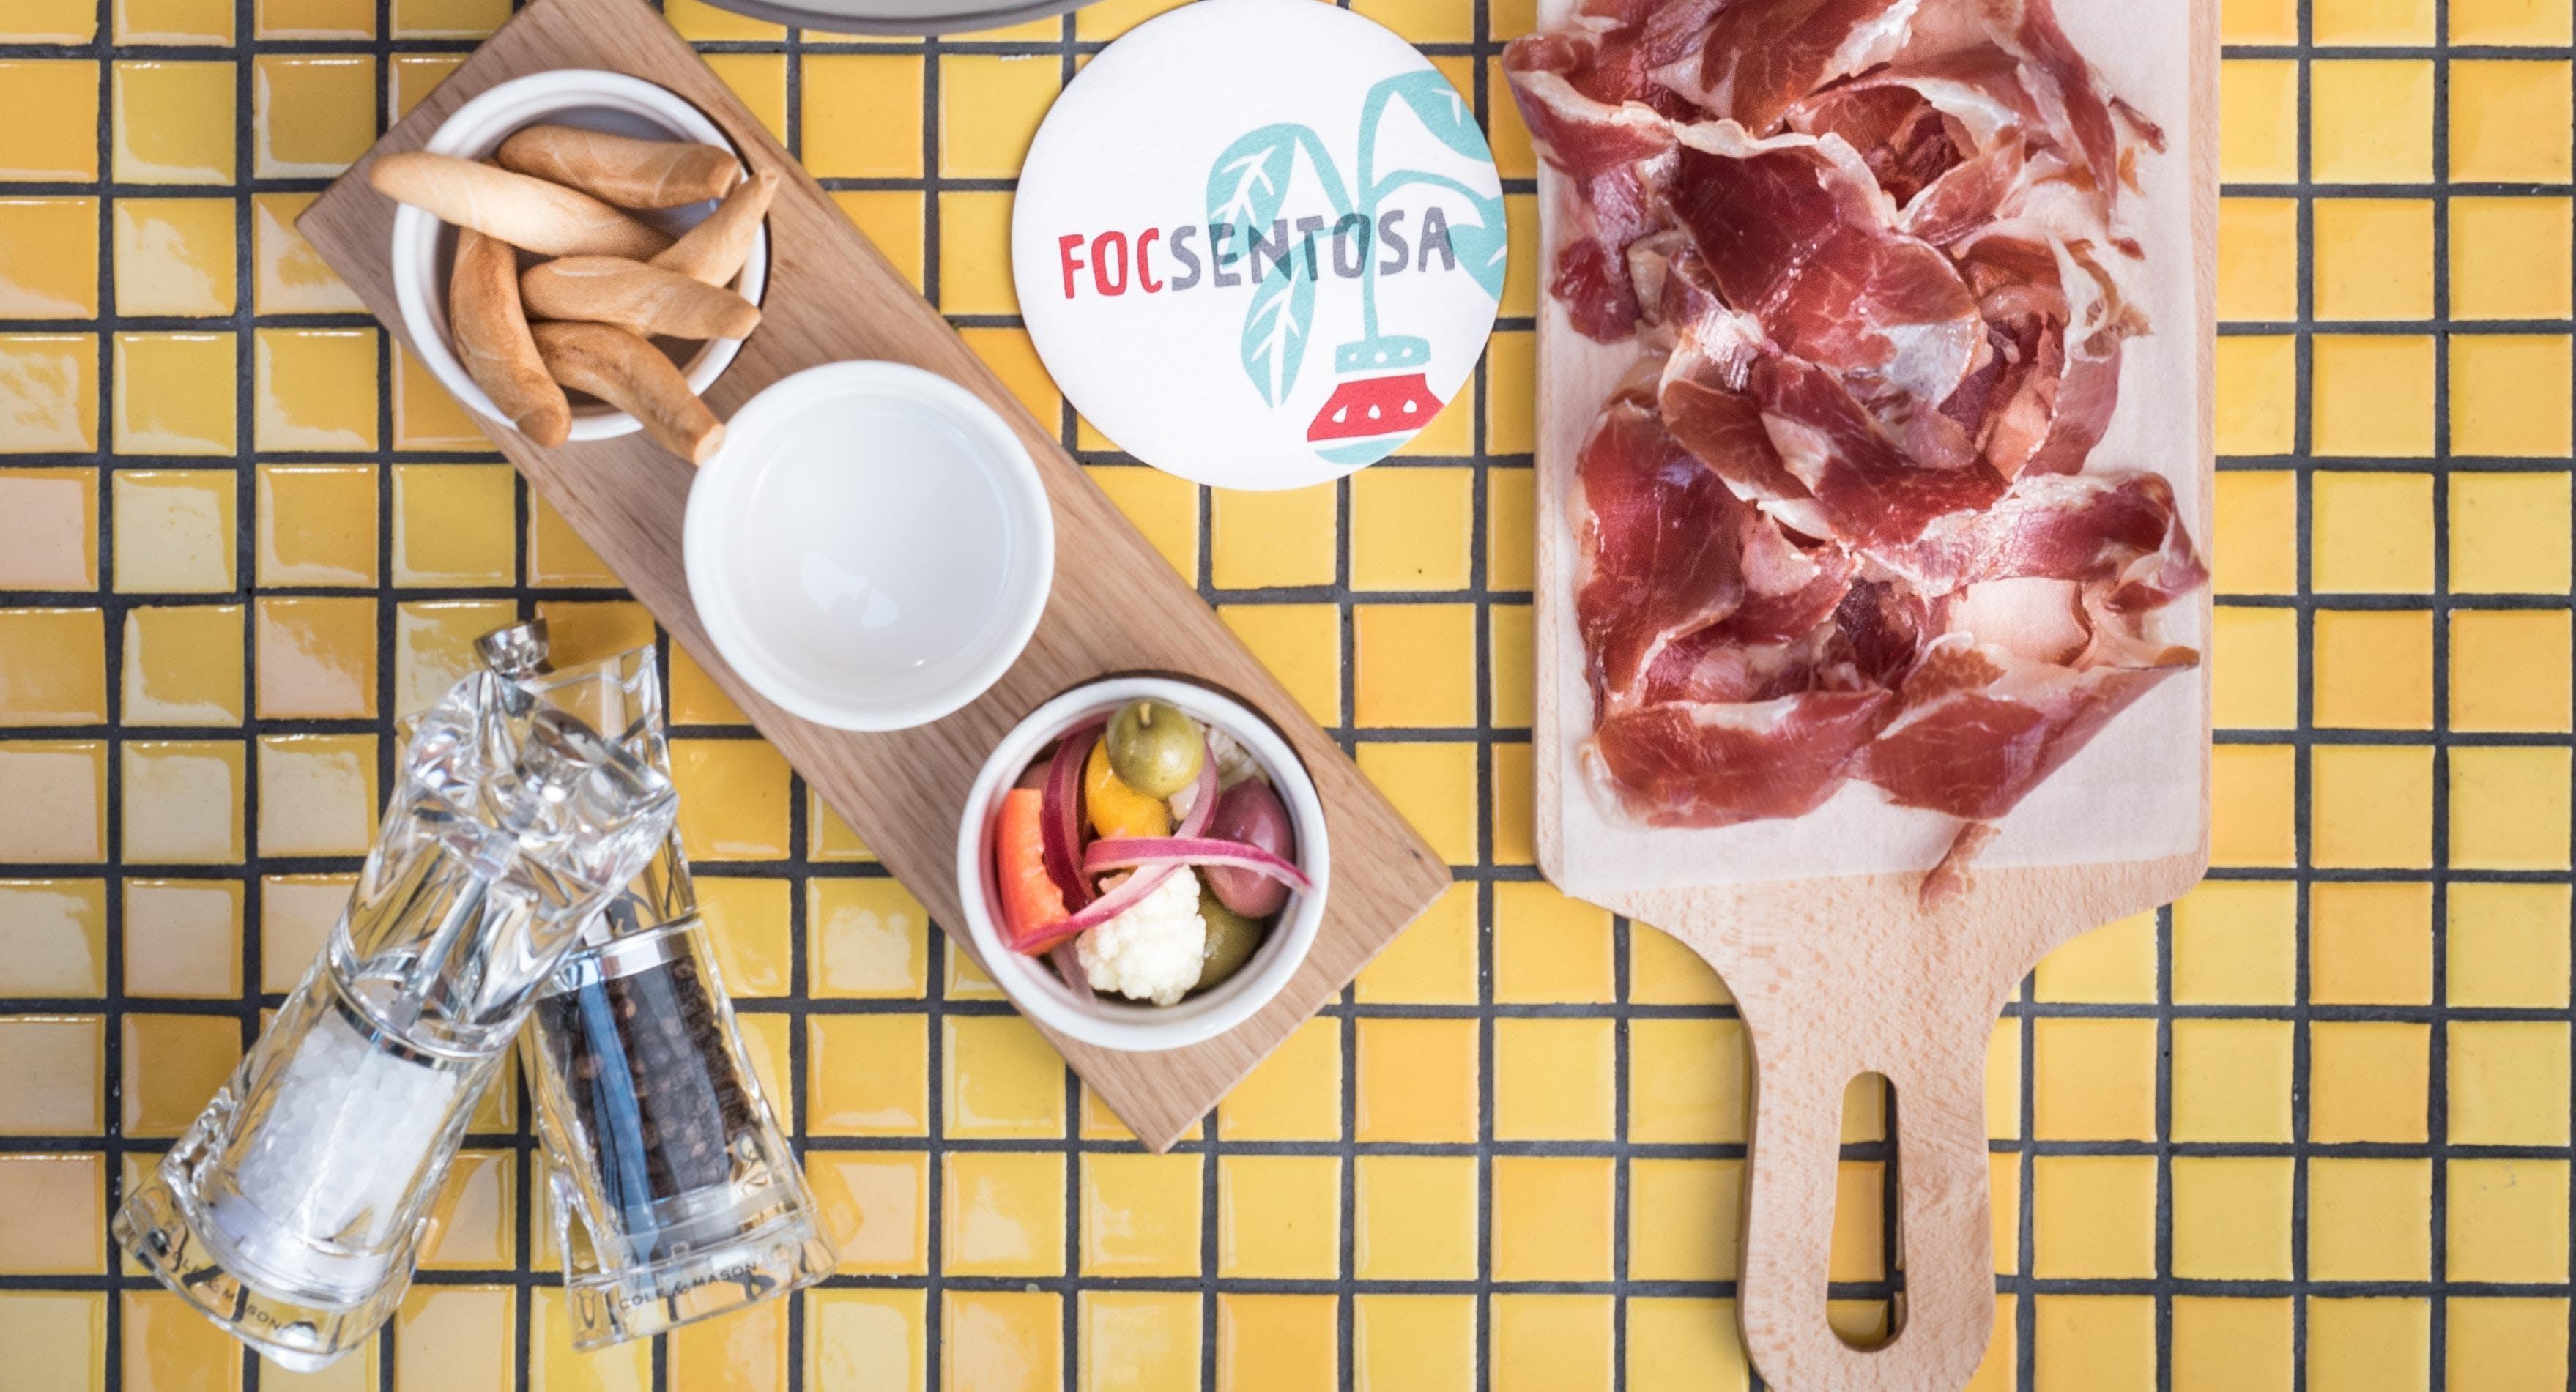 FOC Sentosa Restaurant